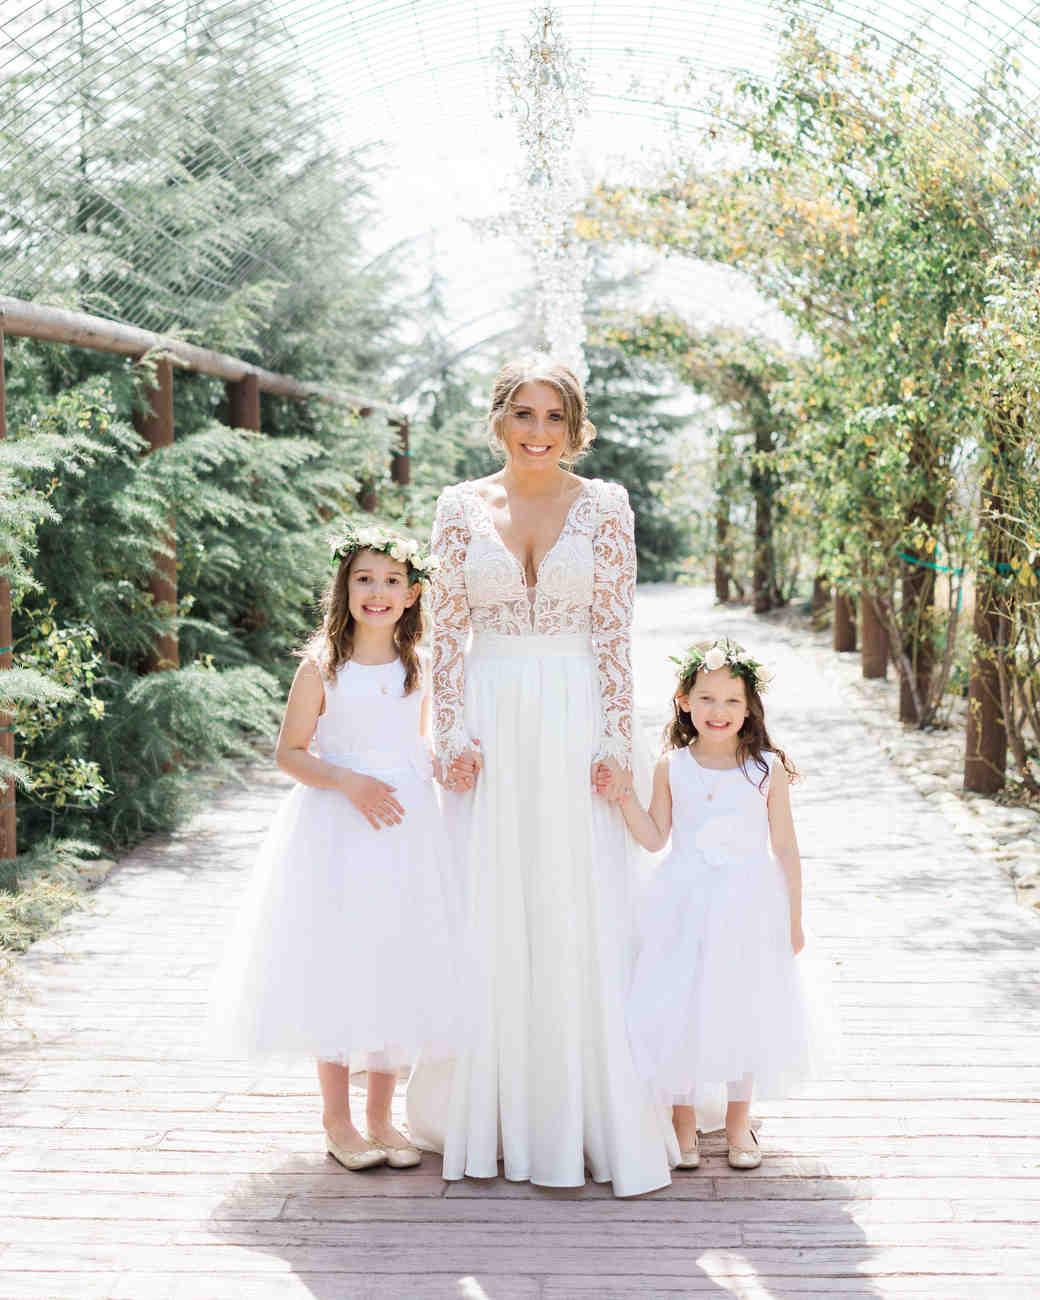 susie joe wedding flower girls